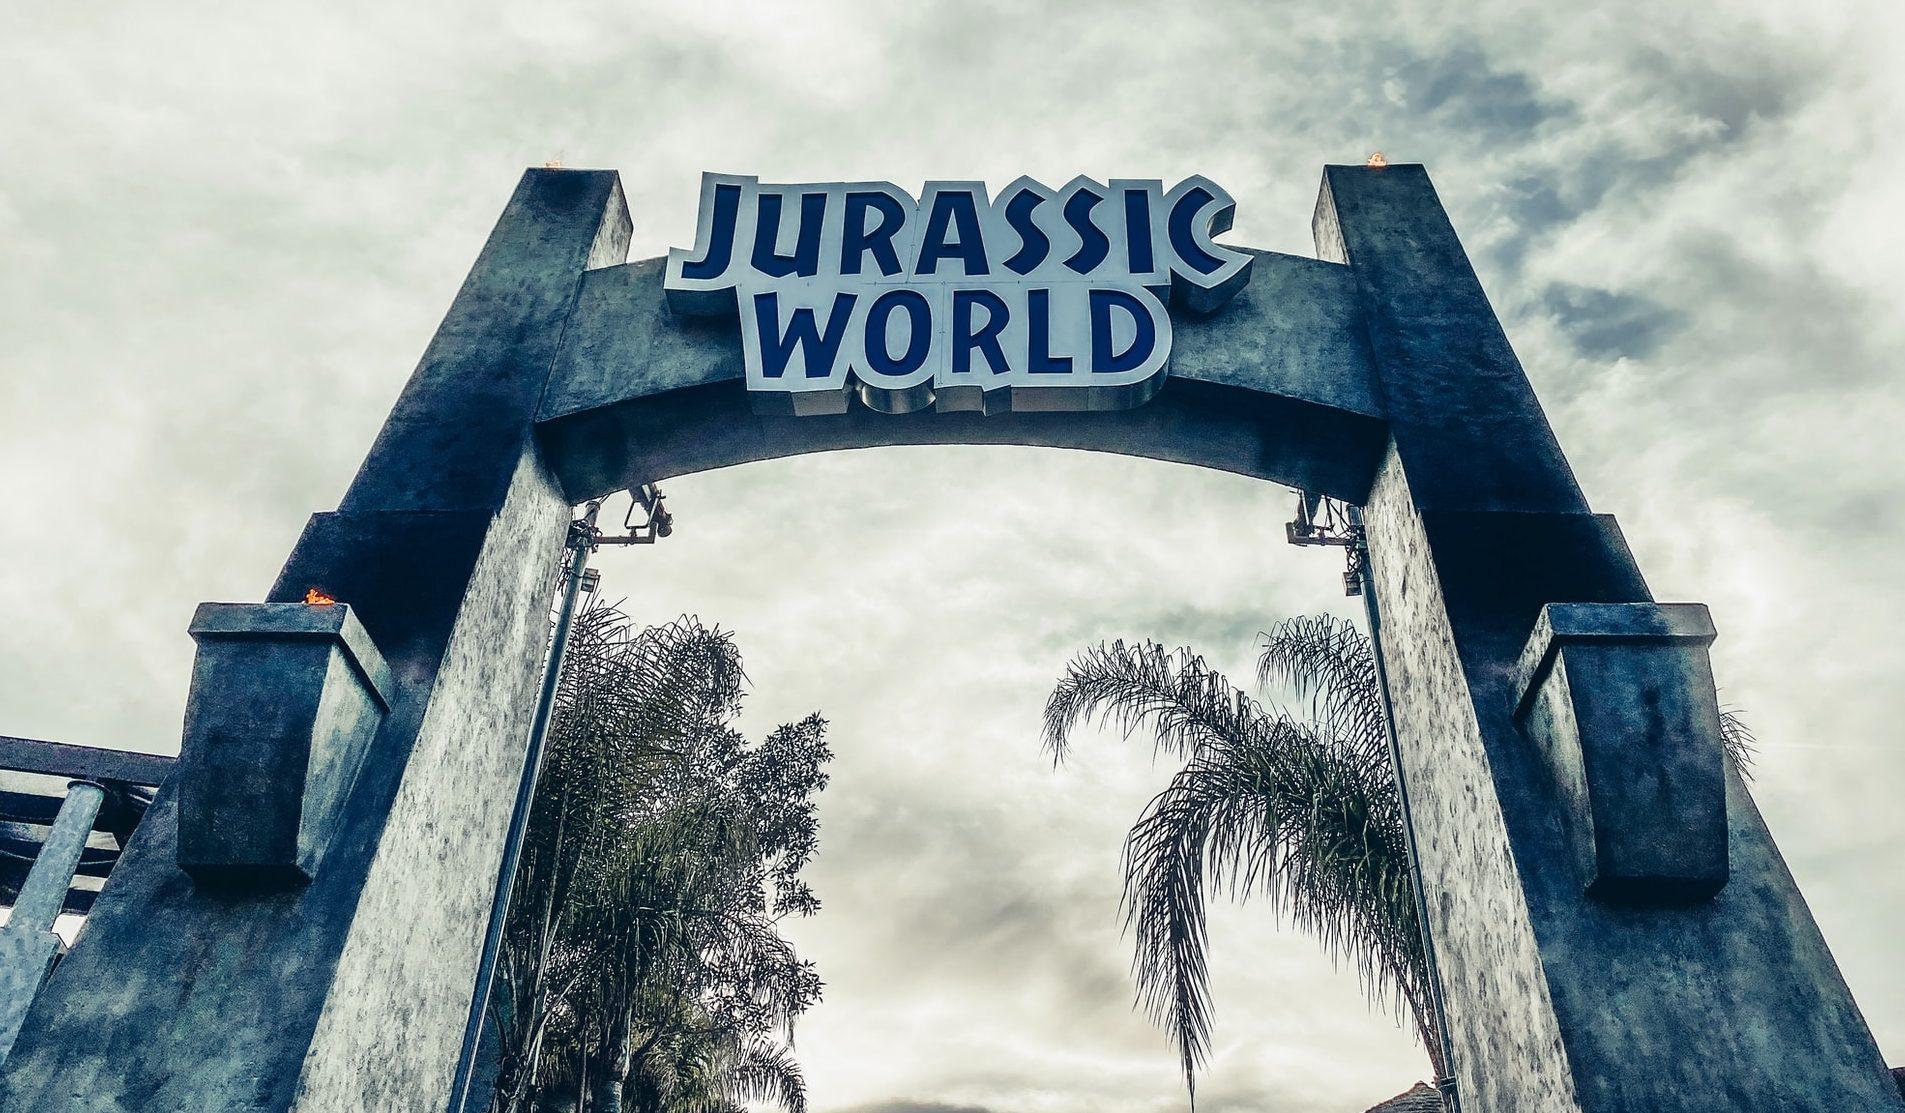 Jurassic World ride sign at Universal Studios Hollywood